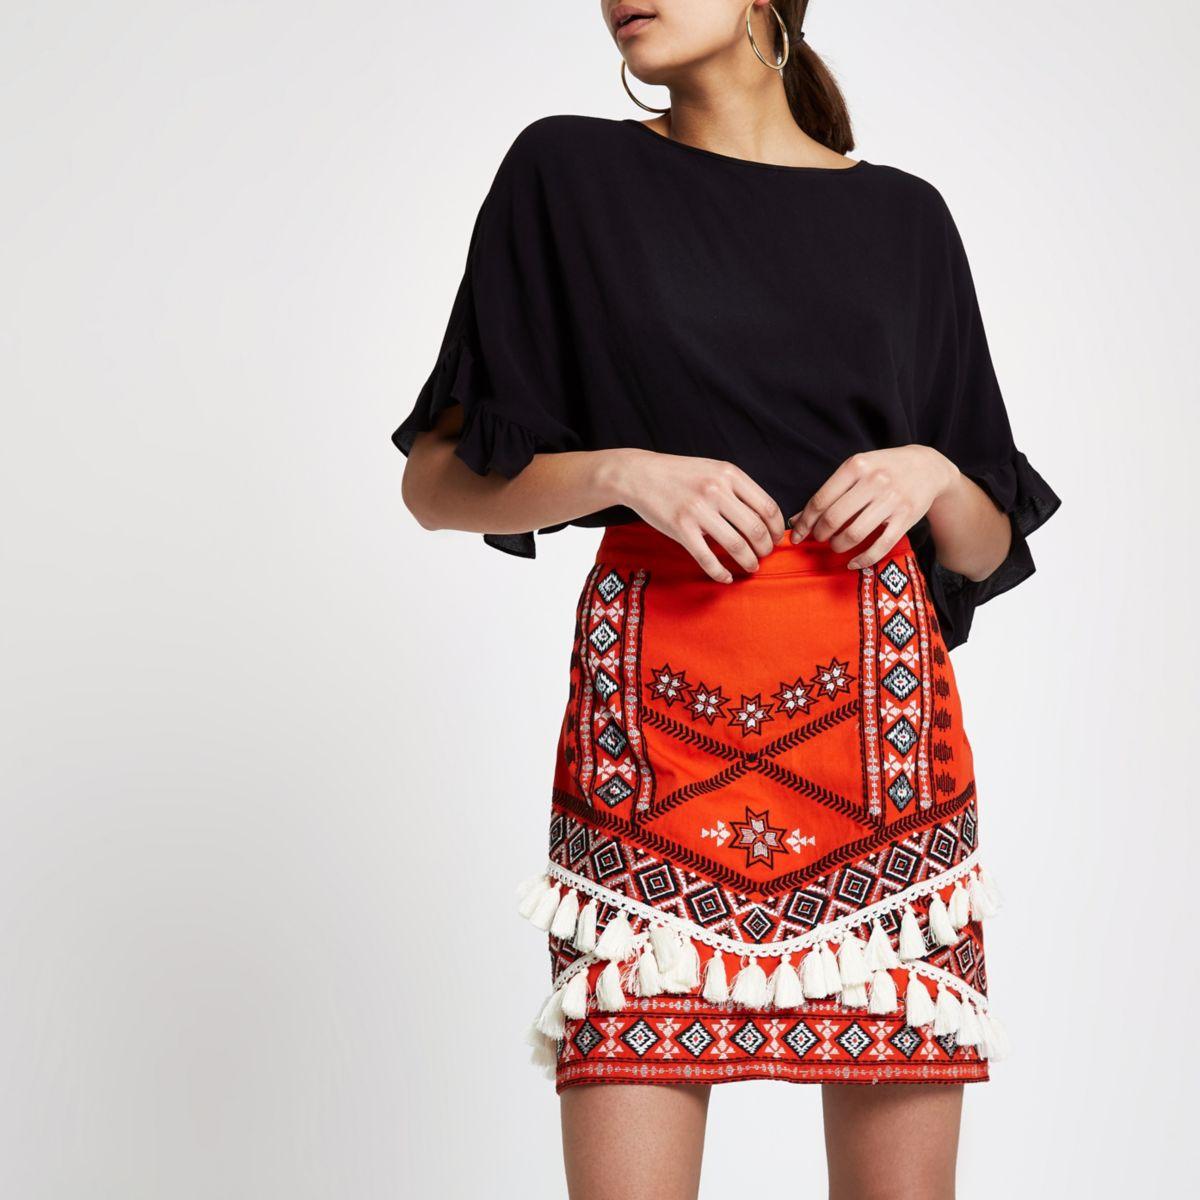 Red tassel embroidered mini skirt